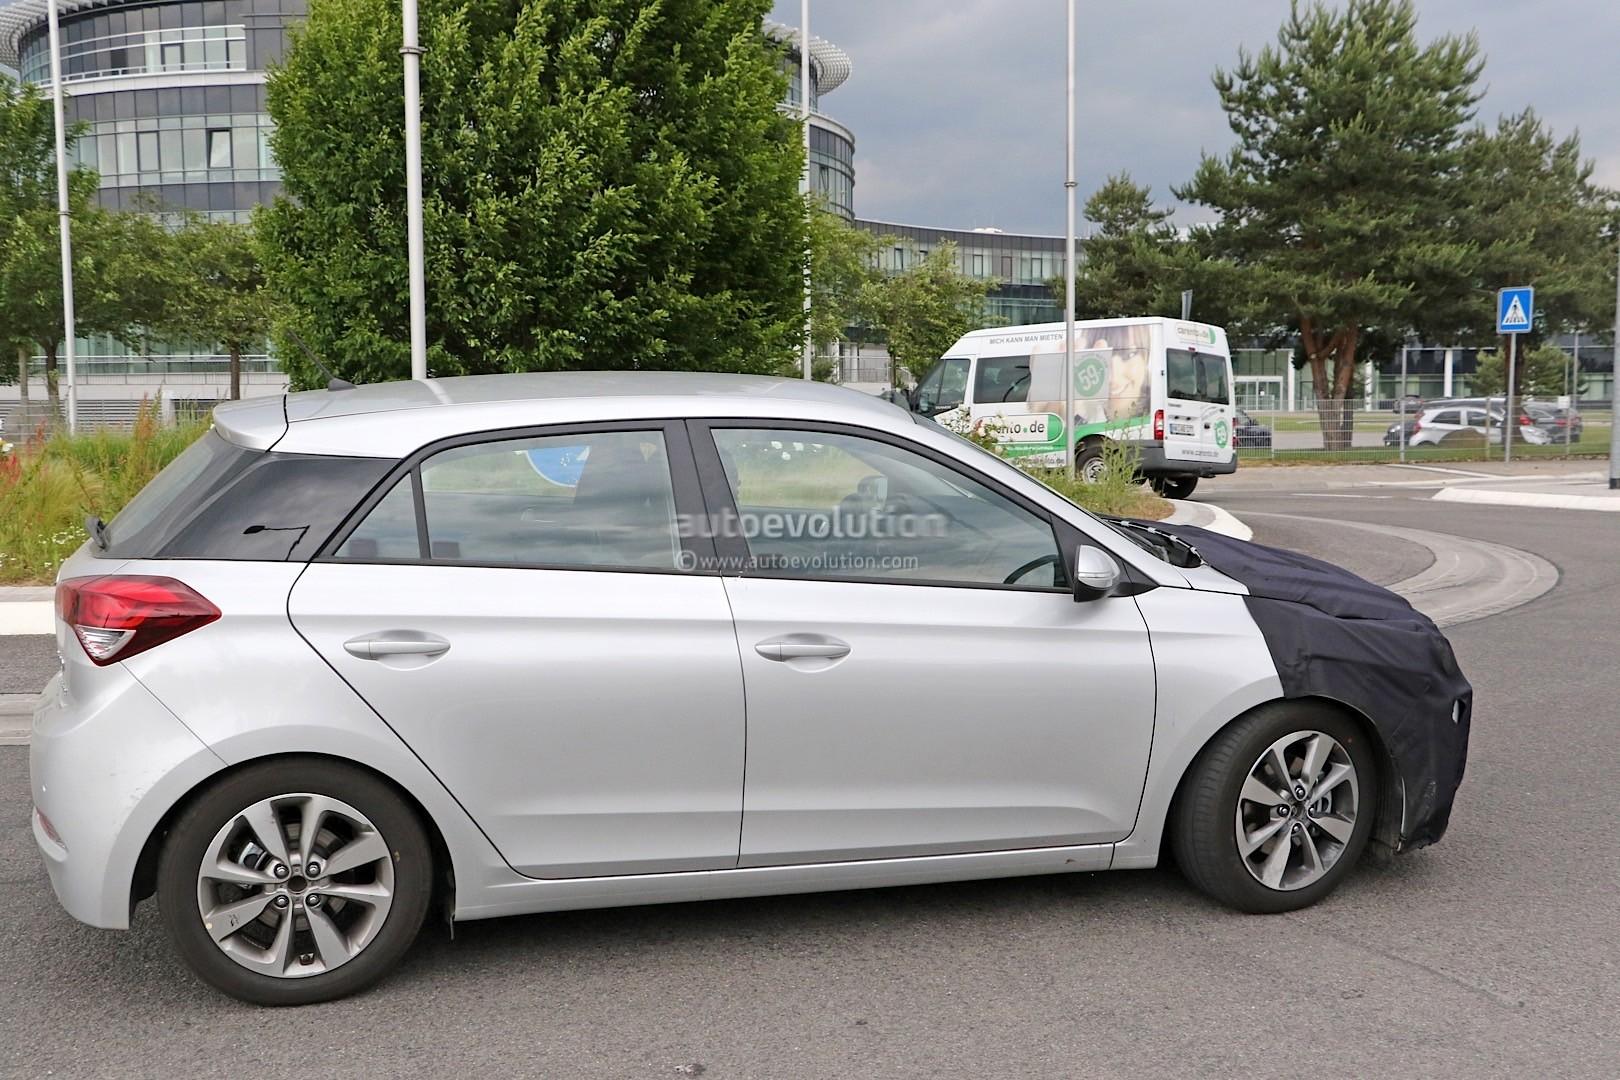 2018 - [Hyundai] I20 restylée Spyshots-hyundai-i20-prototype-spied-we-think-it-s-a-facelifted-version_4